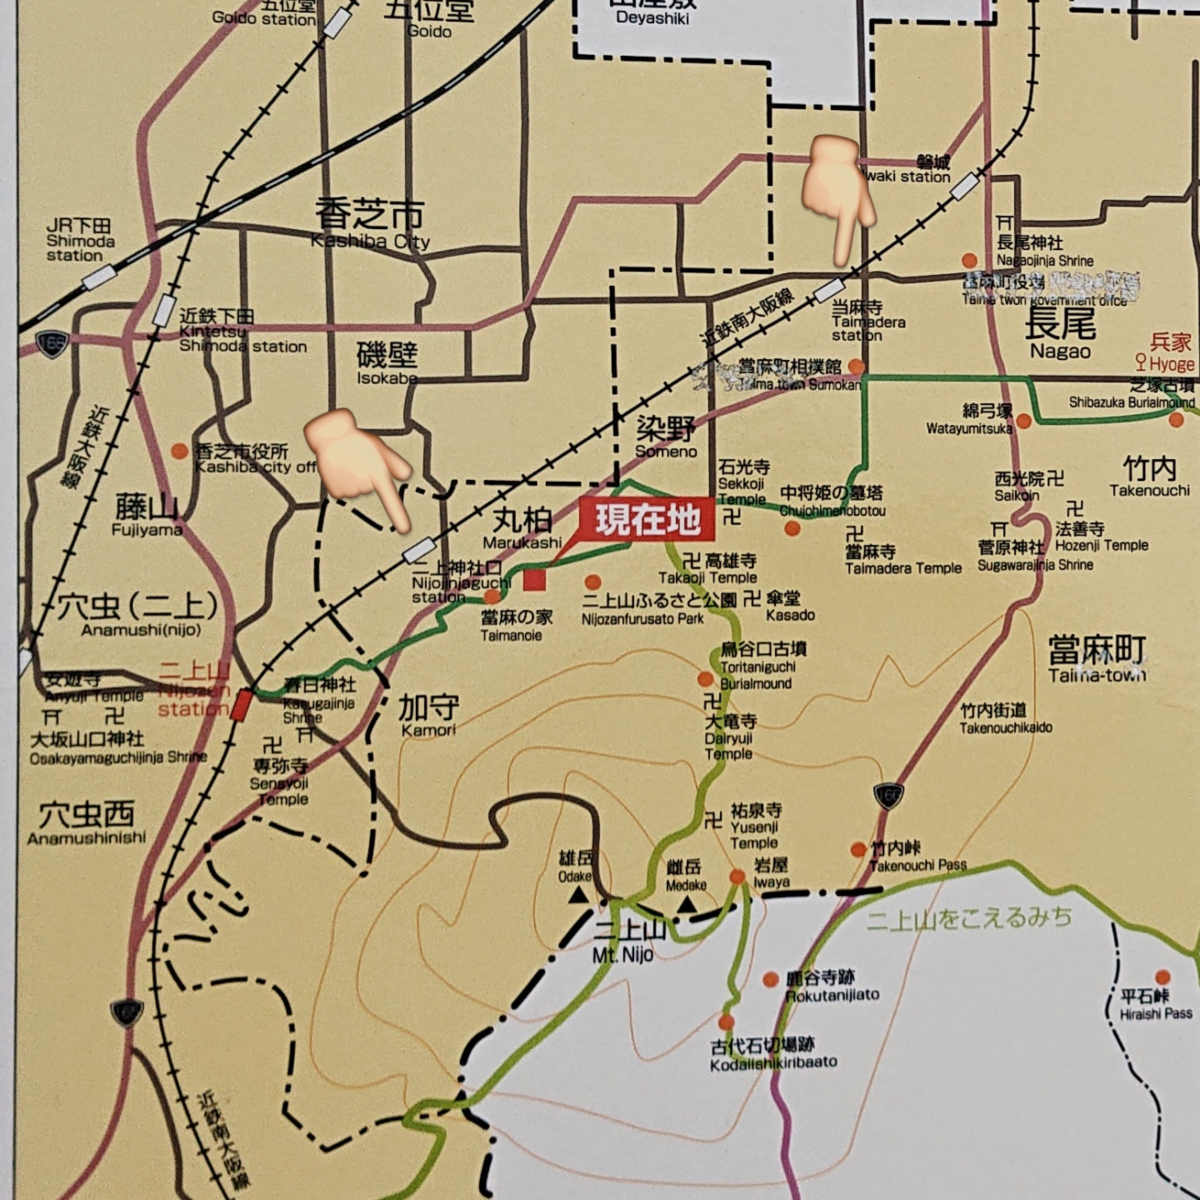 f:id:Kaimotu_Hatuji:20200724183111p:plain